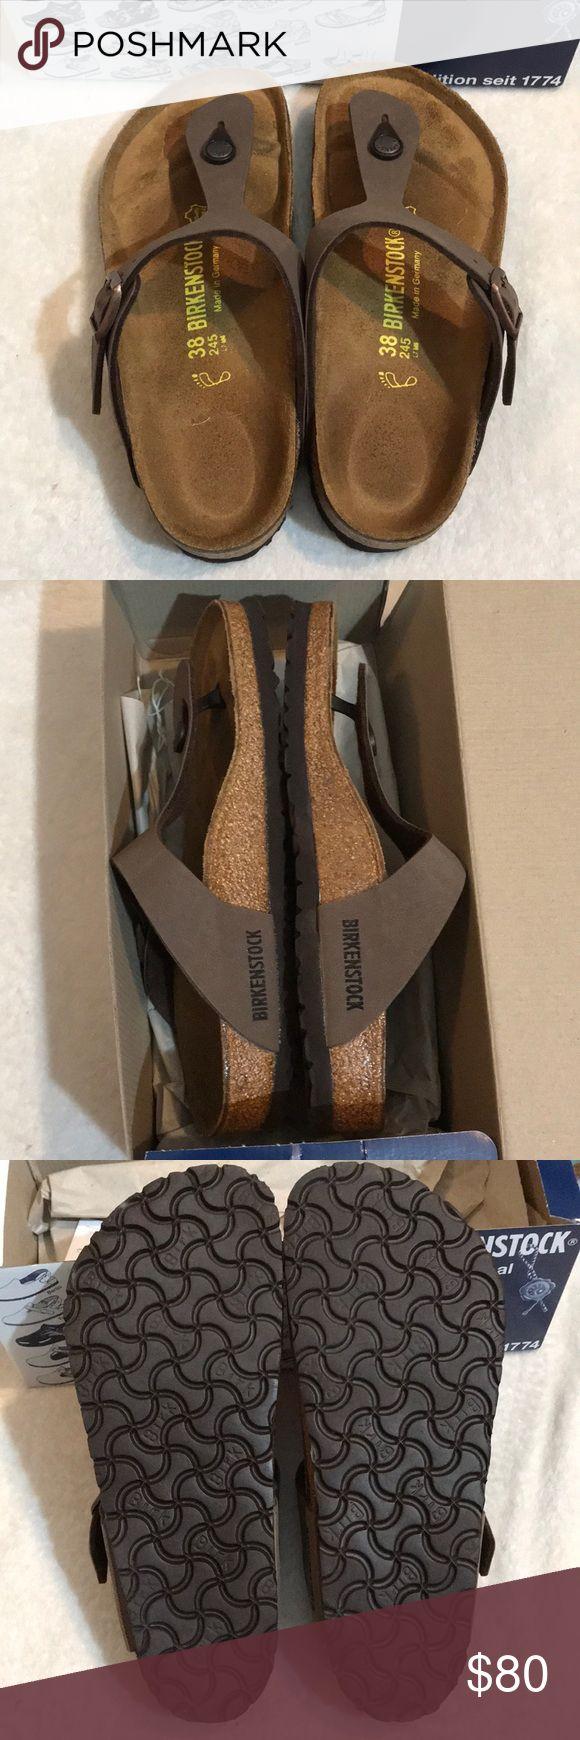 Birkenstock slipper Brand new Birkenstock slipper still in the box Birkenstock Shoes Slippers